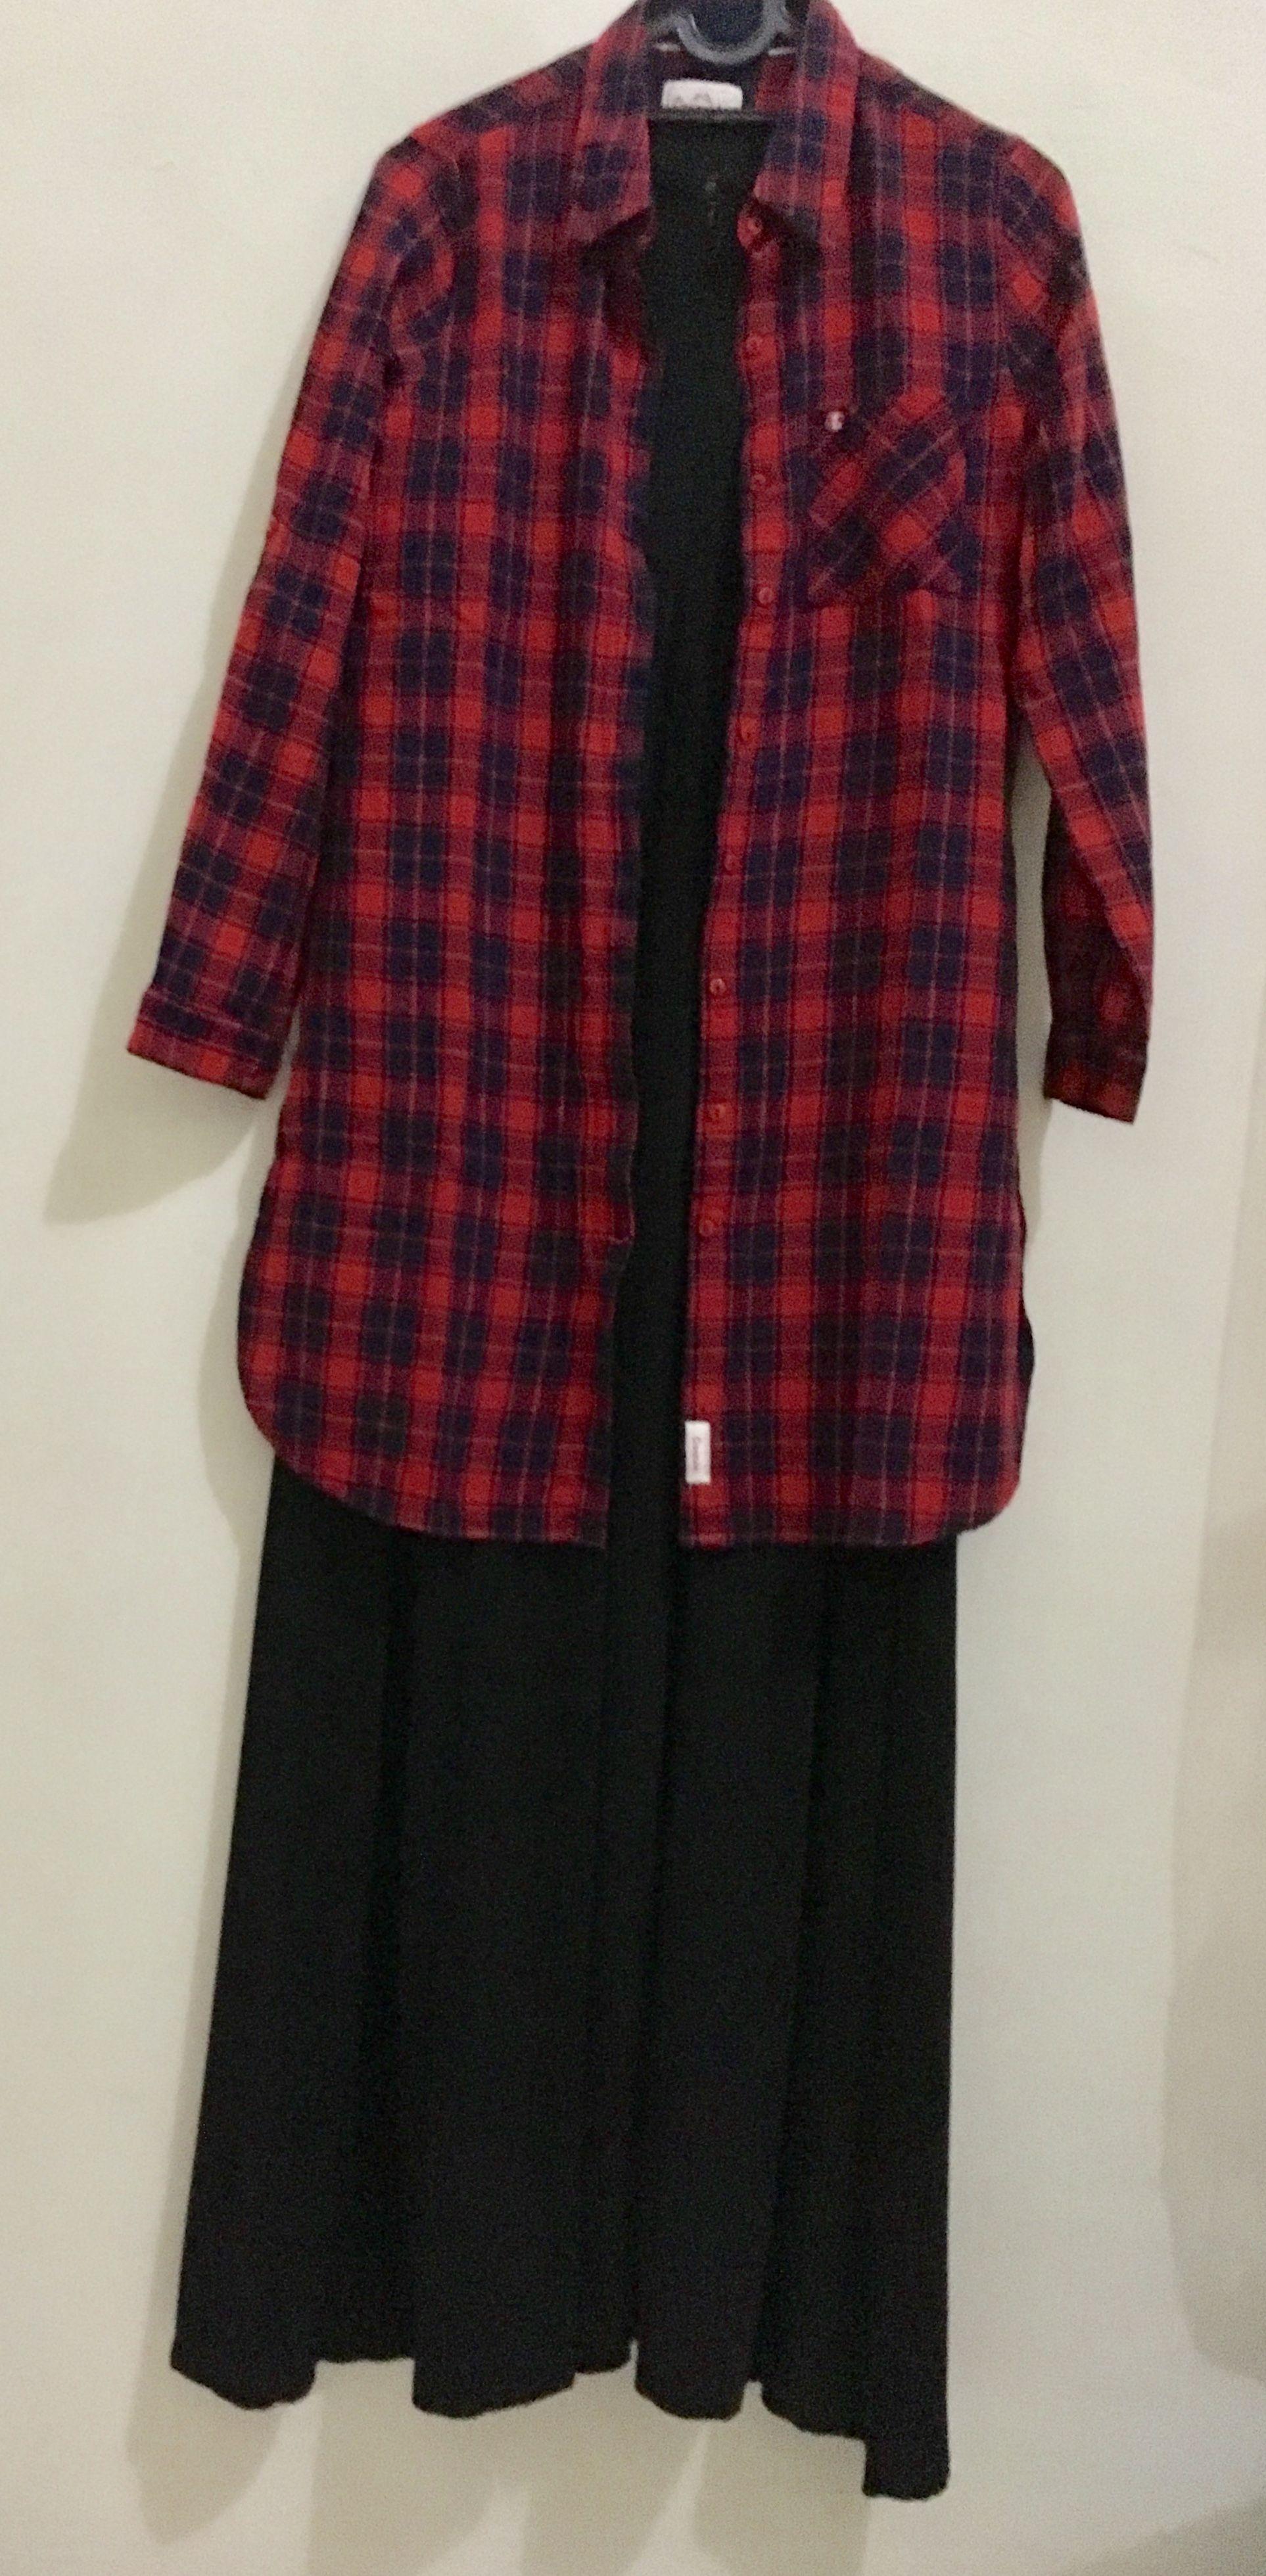 Black Dress With Flannel Shirt [ 3919 x 1926 Pixel ]